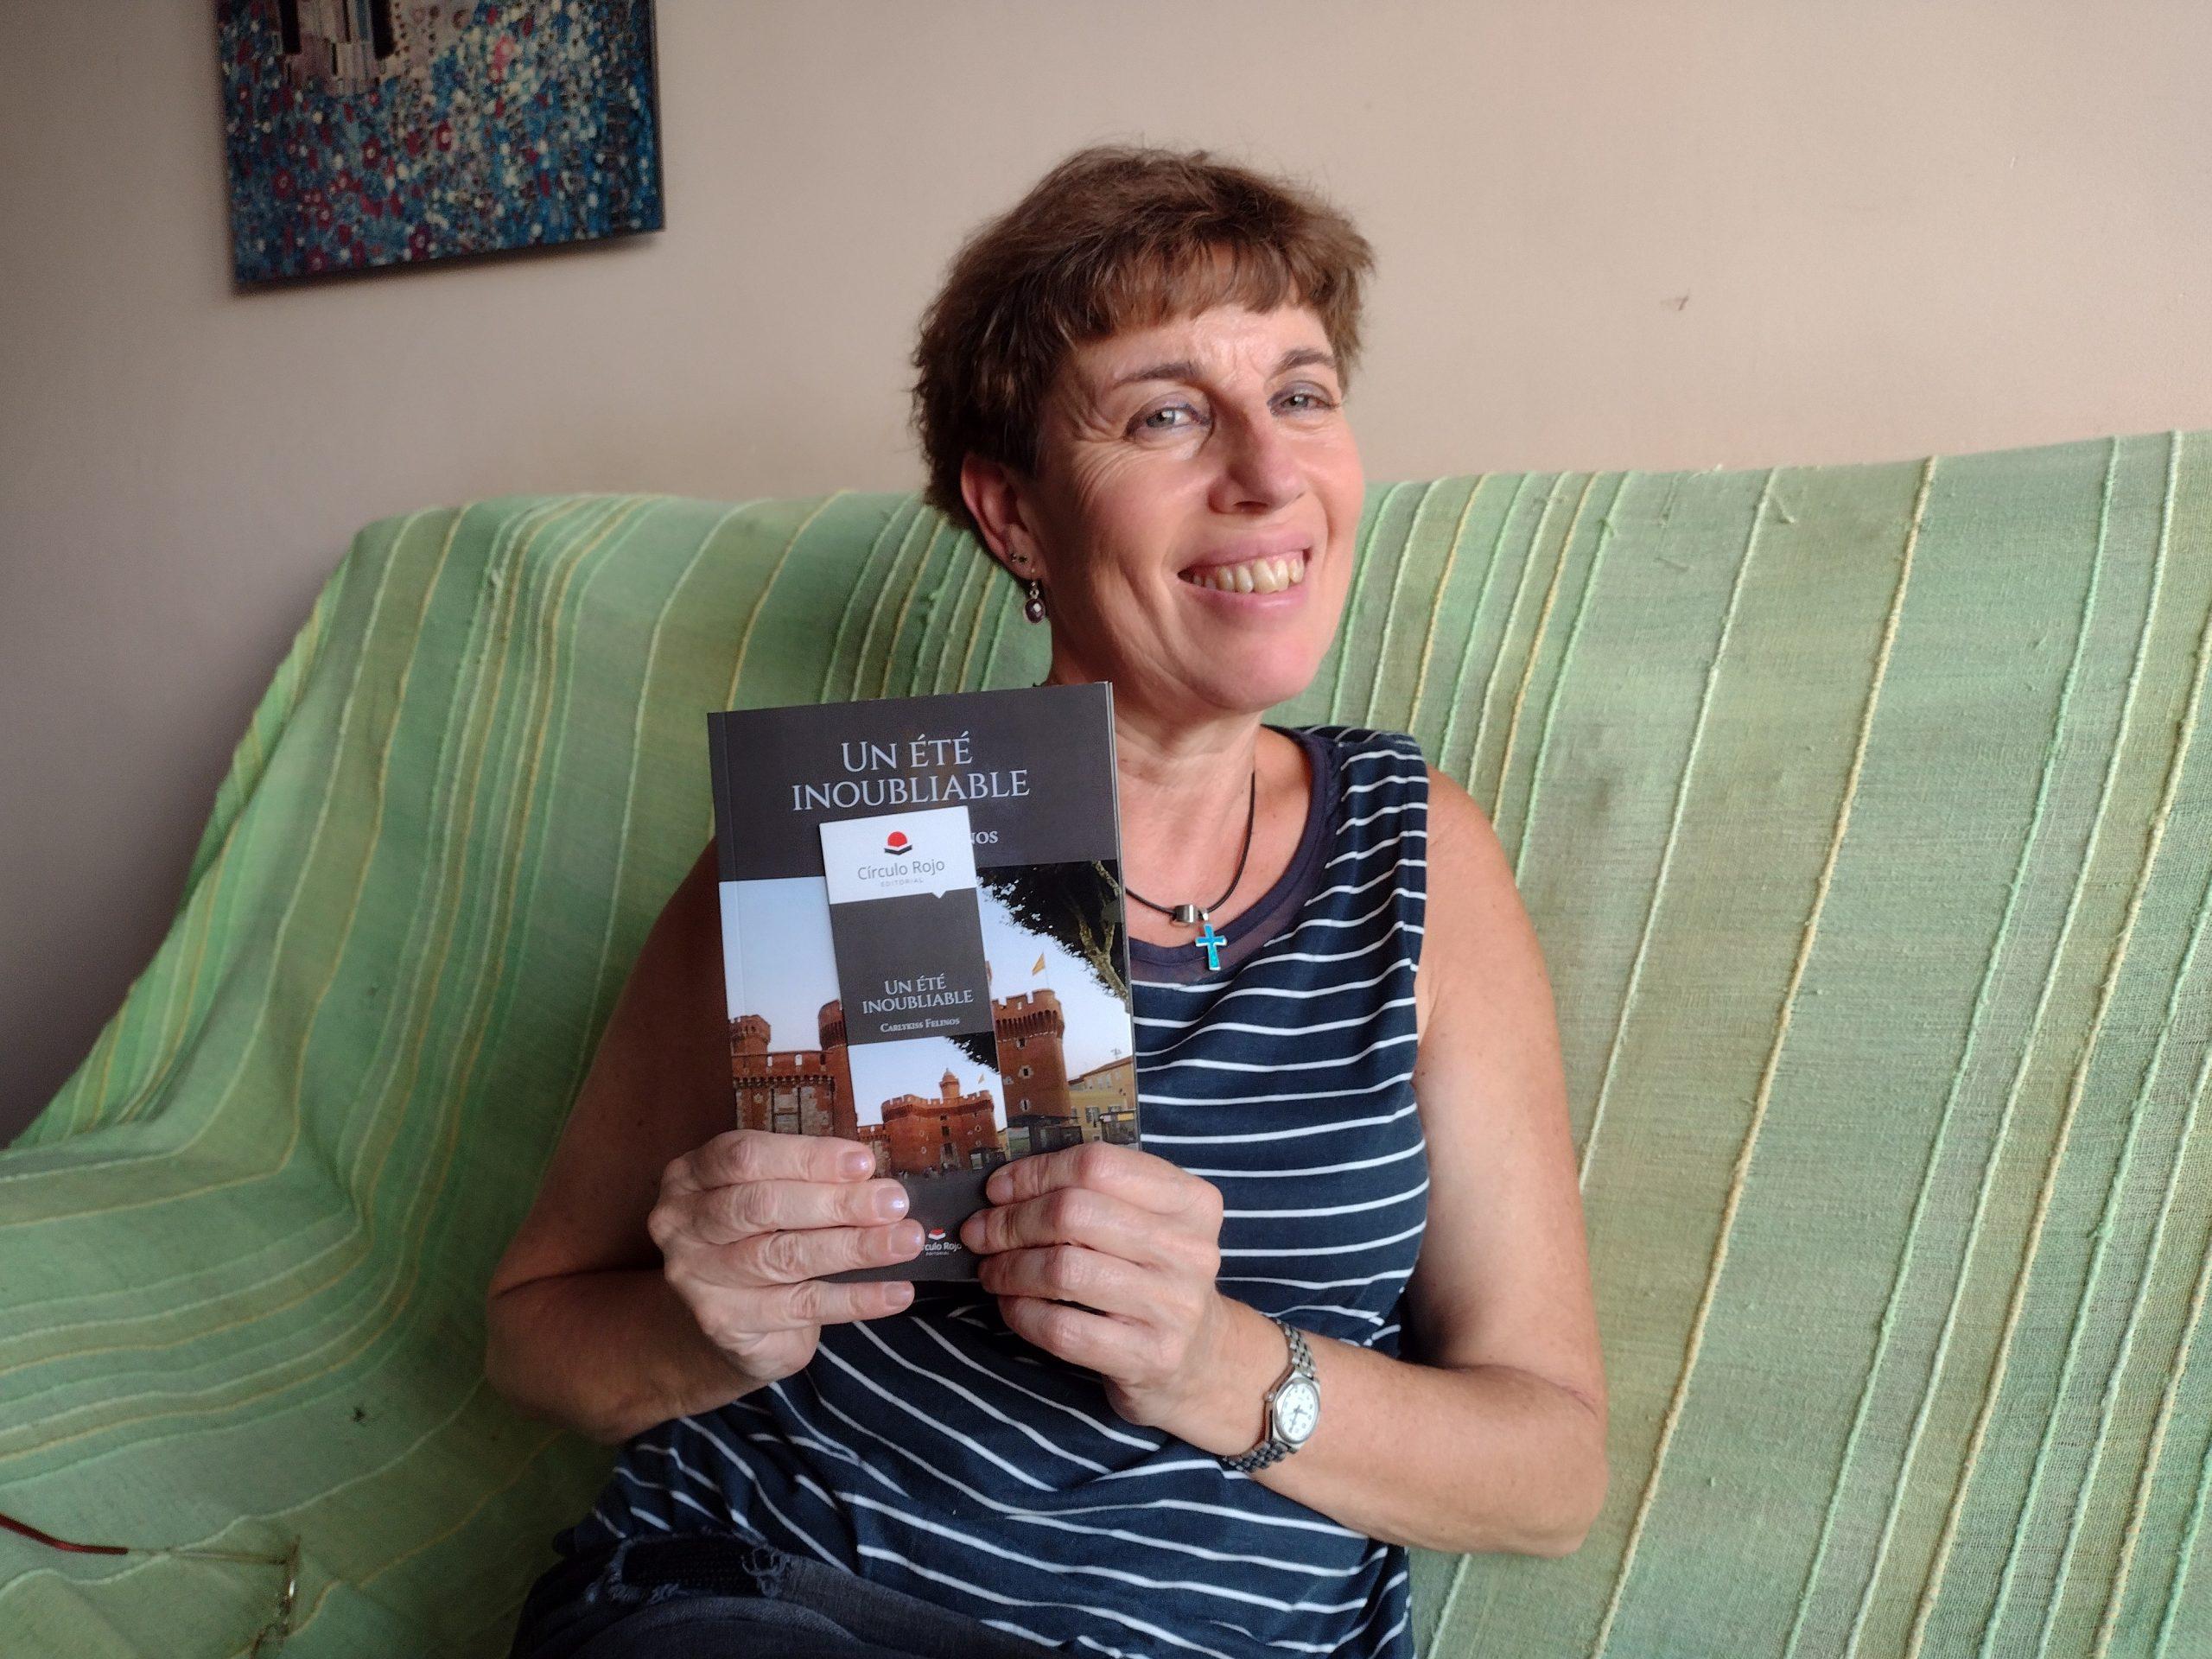 Conoce a Carlykiss felinos, autora de Un Été Inoubliable